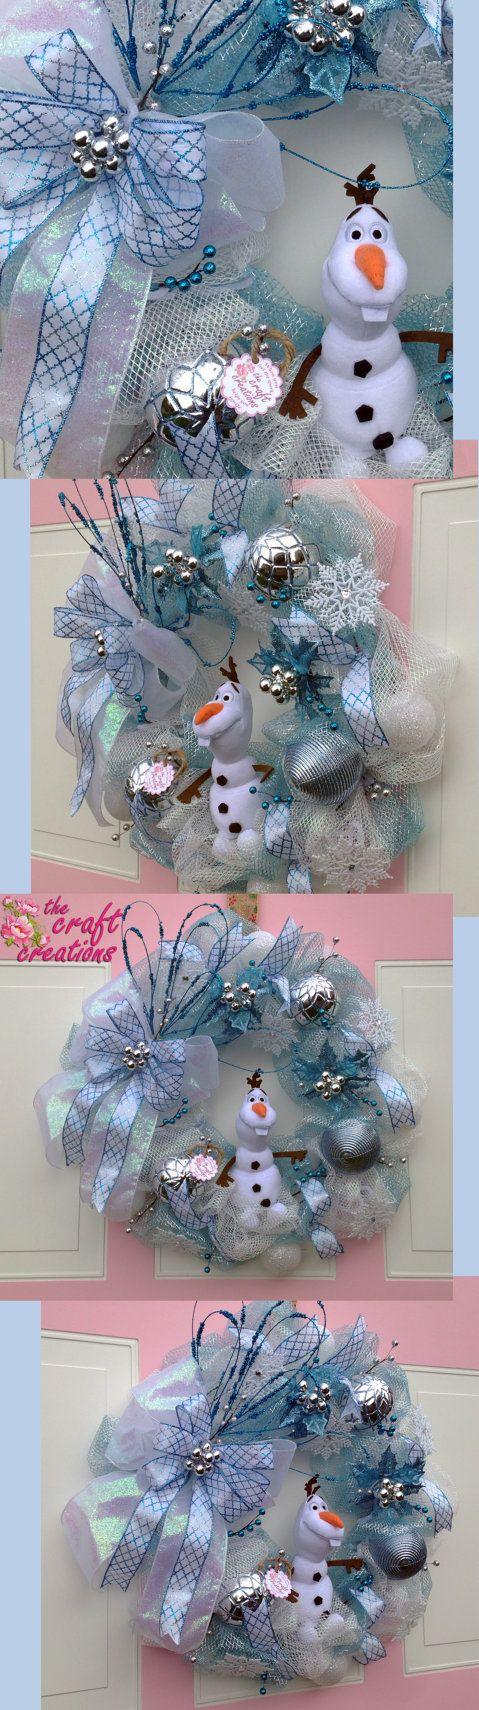 OLAF of DISNEY FROZEN wreath by TheCraftCreation on Etsy https://www.etsy.com/listing/254091935/olaf-of-disney-frozenwreath-blue-and